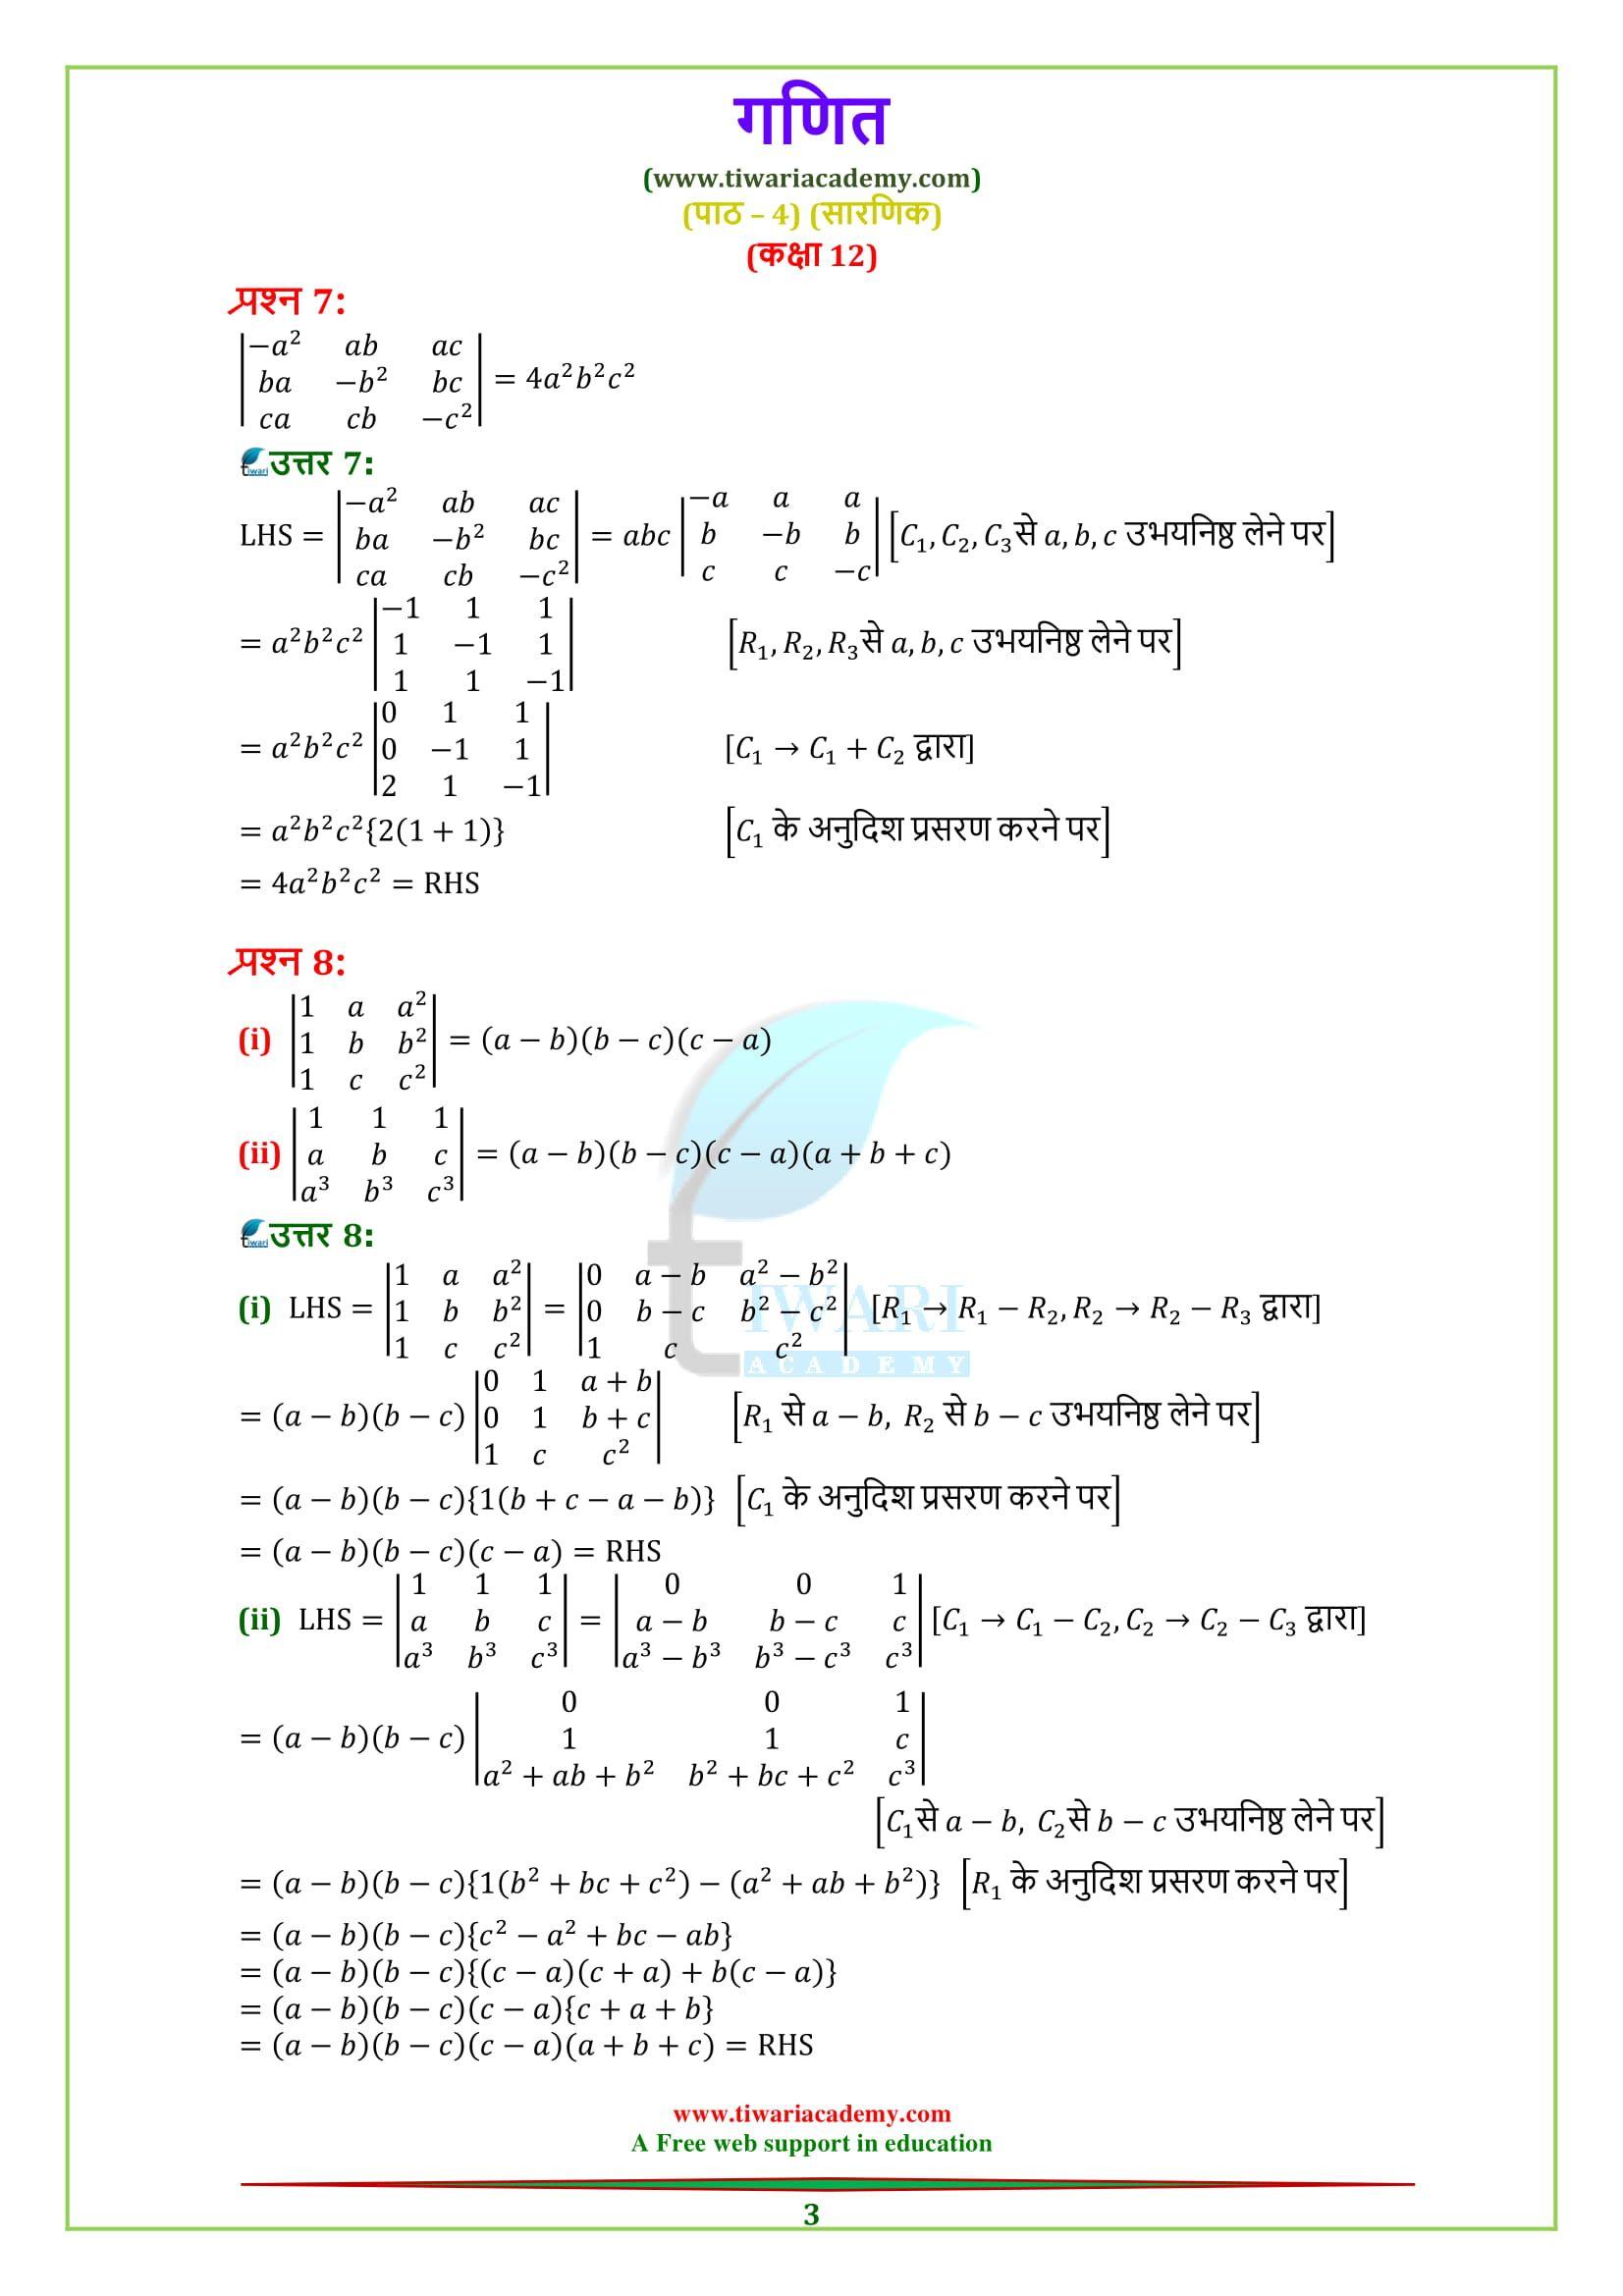 12 Maths In Hindi Medium Class 12 Maths Solving Quadratic Equations Free Math Resources [ 2339 x 1653 Pixel ]